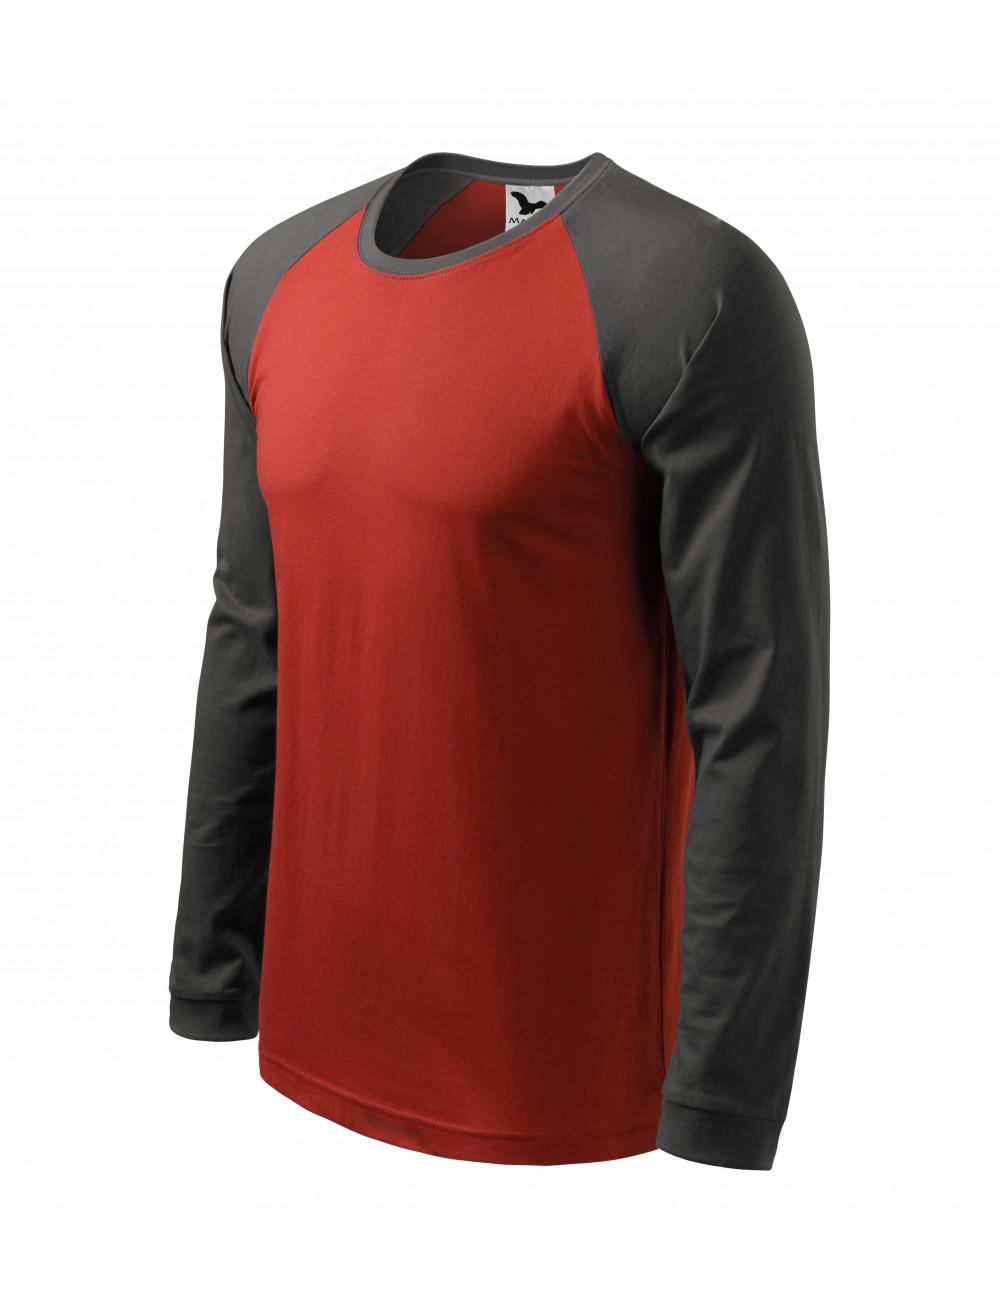 Adler MALFINI Koszulka męska Street LS 130 marlboro czerwony